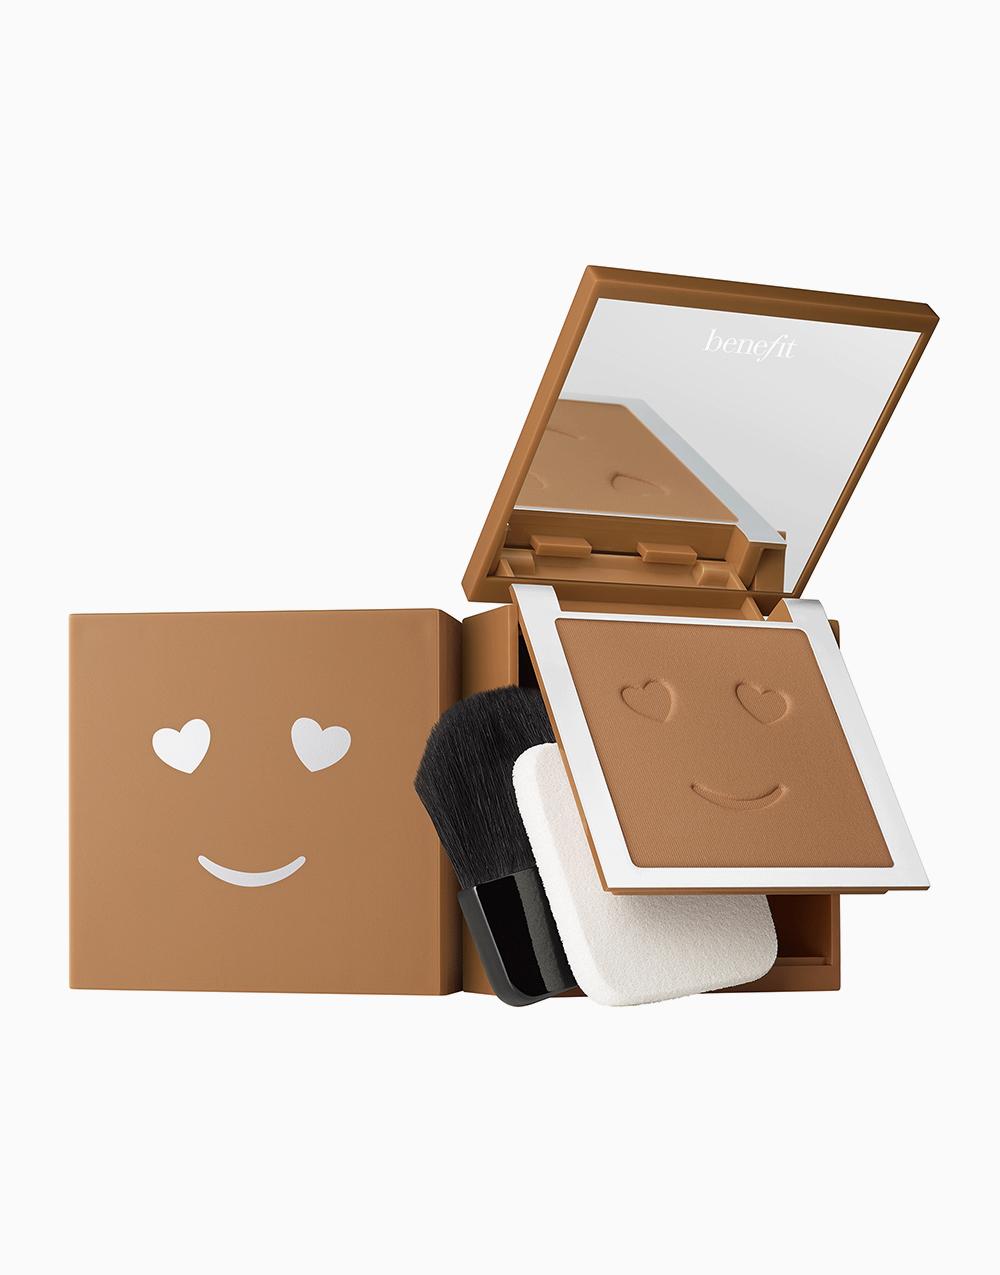 Hello Happy Velvet Powder Foundation by Benefit | Shade 11